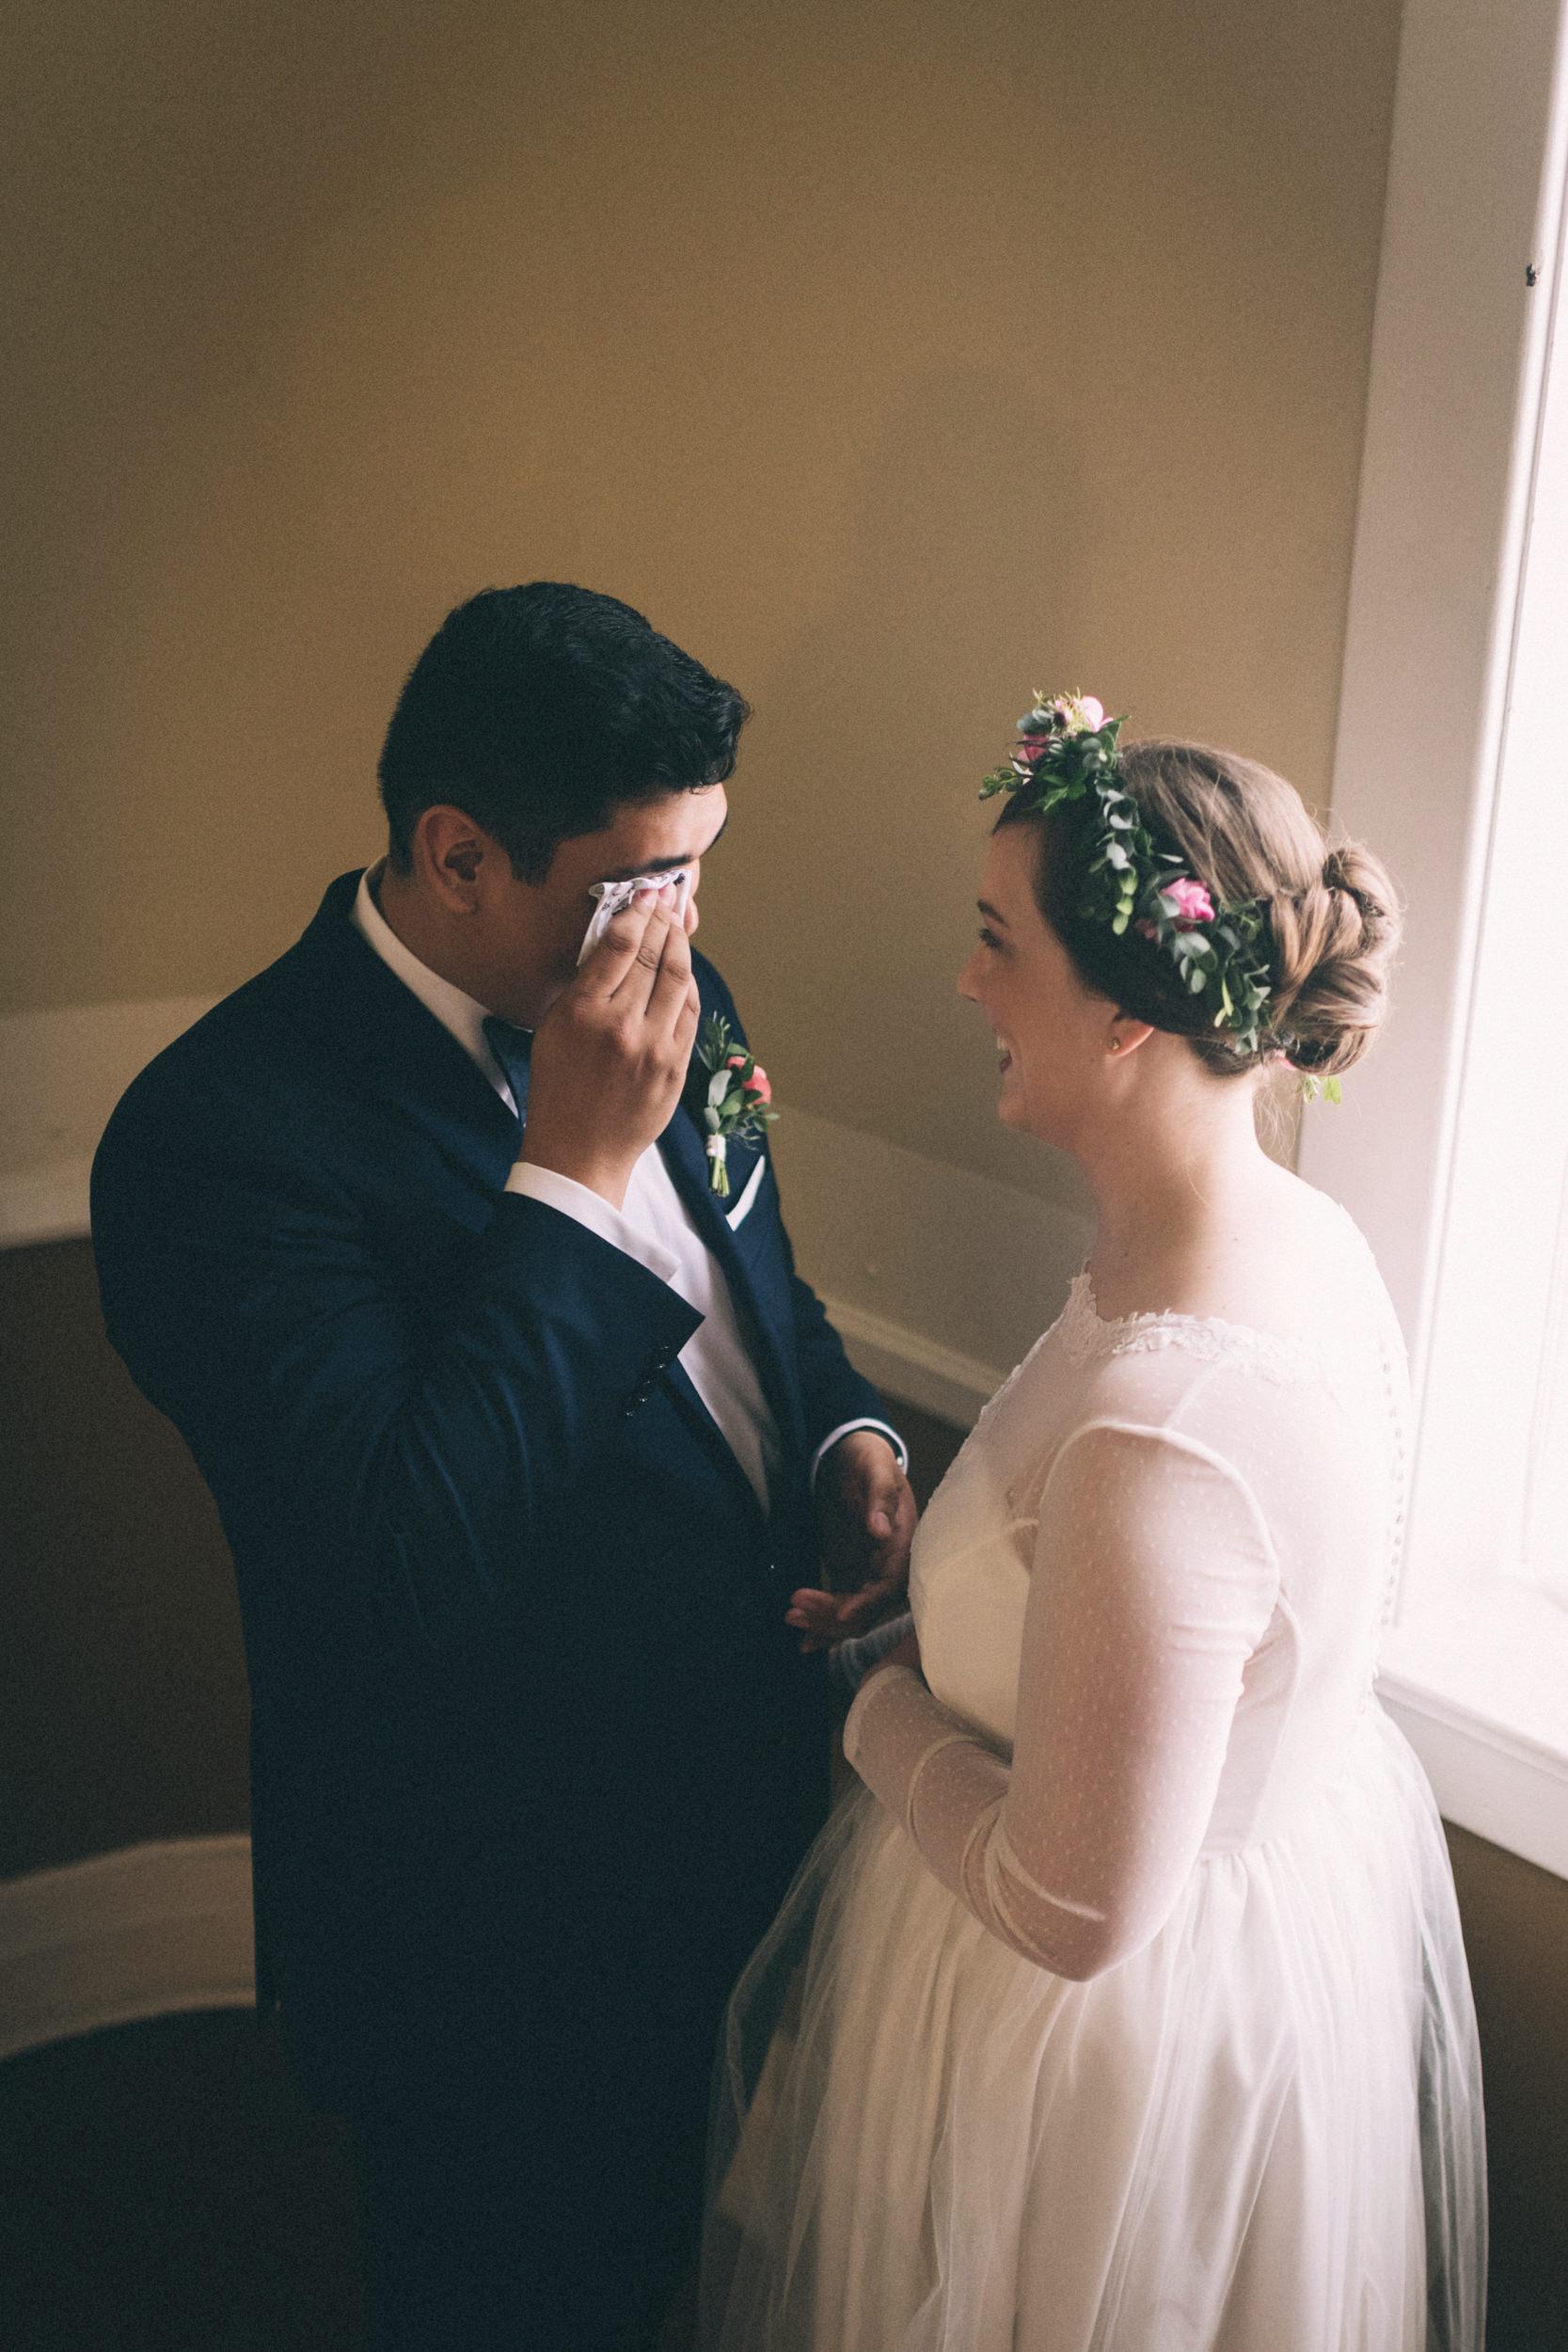 lauren-dean-wedding-grand-lodge-kentucky-sarah-katherine-davis-photography-145edit.jpg